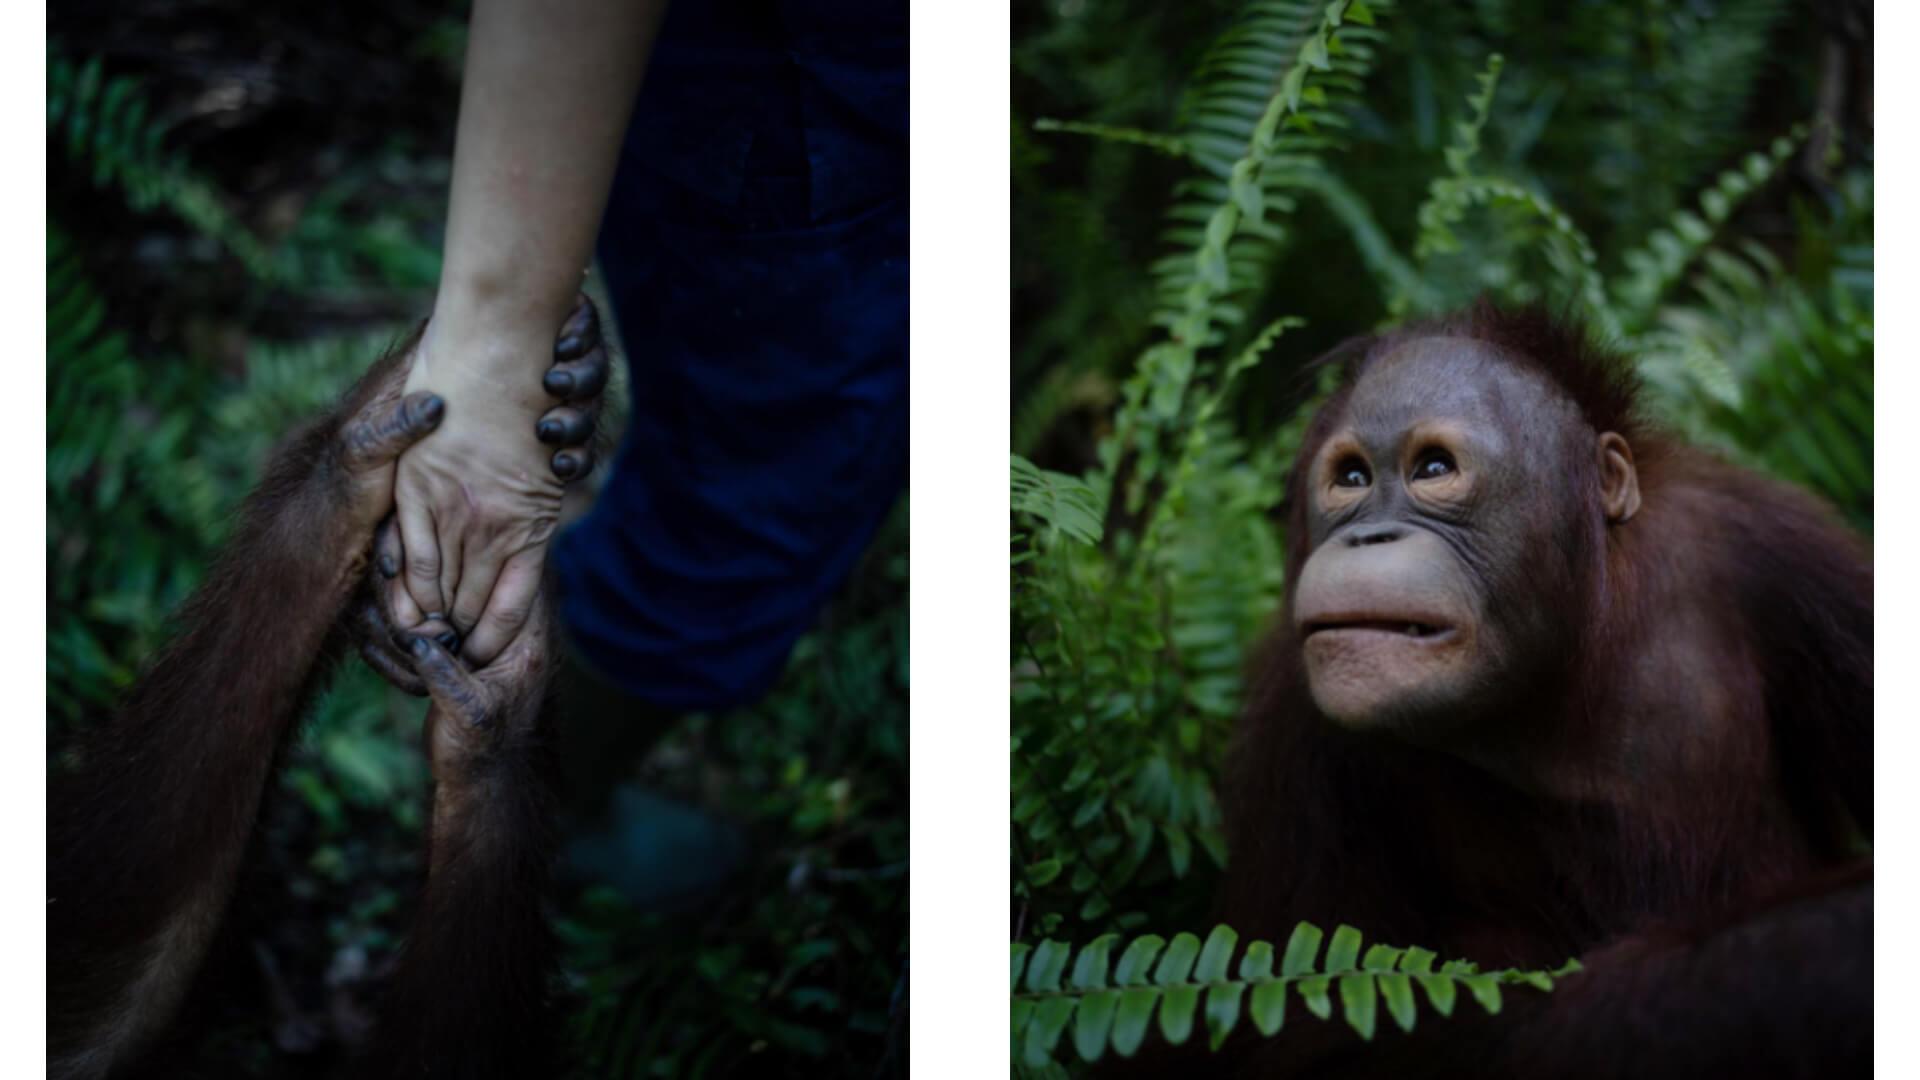 human and orangutan holding hands and an orangutan in the Bornean